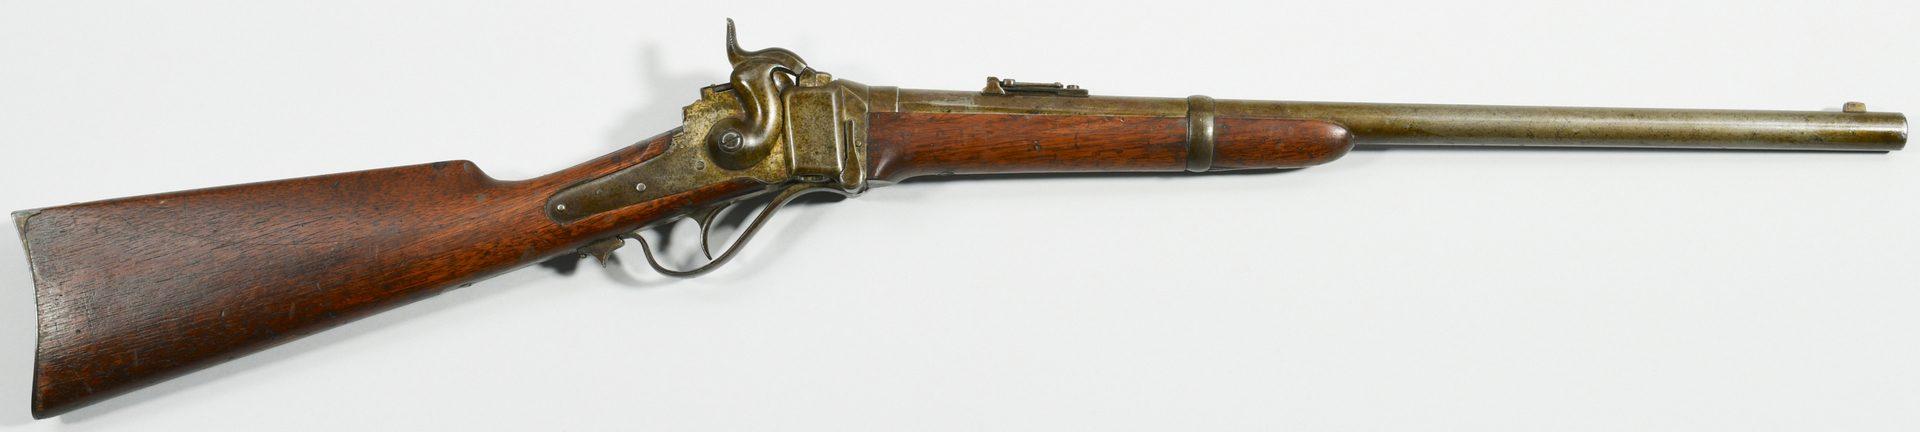 Lot 298: Sharps New Model 1859 Carbine, .52 Caliber